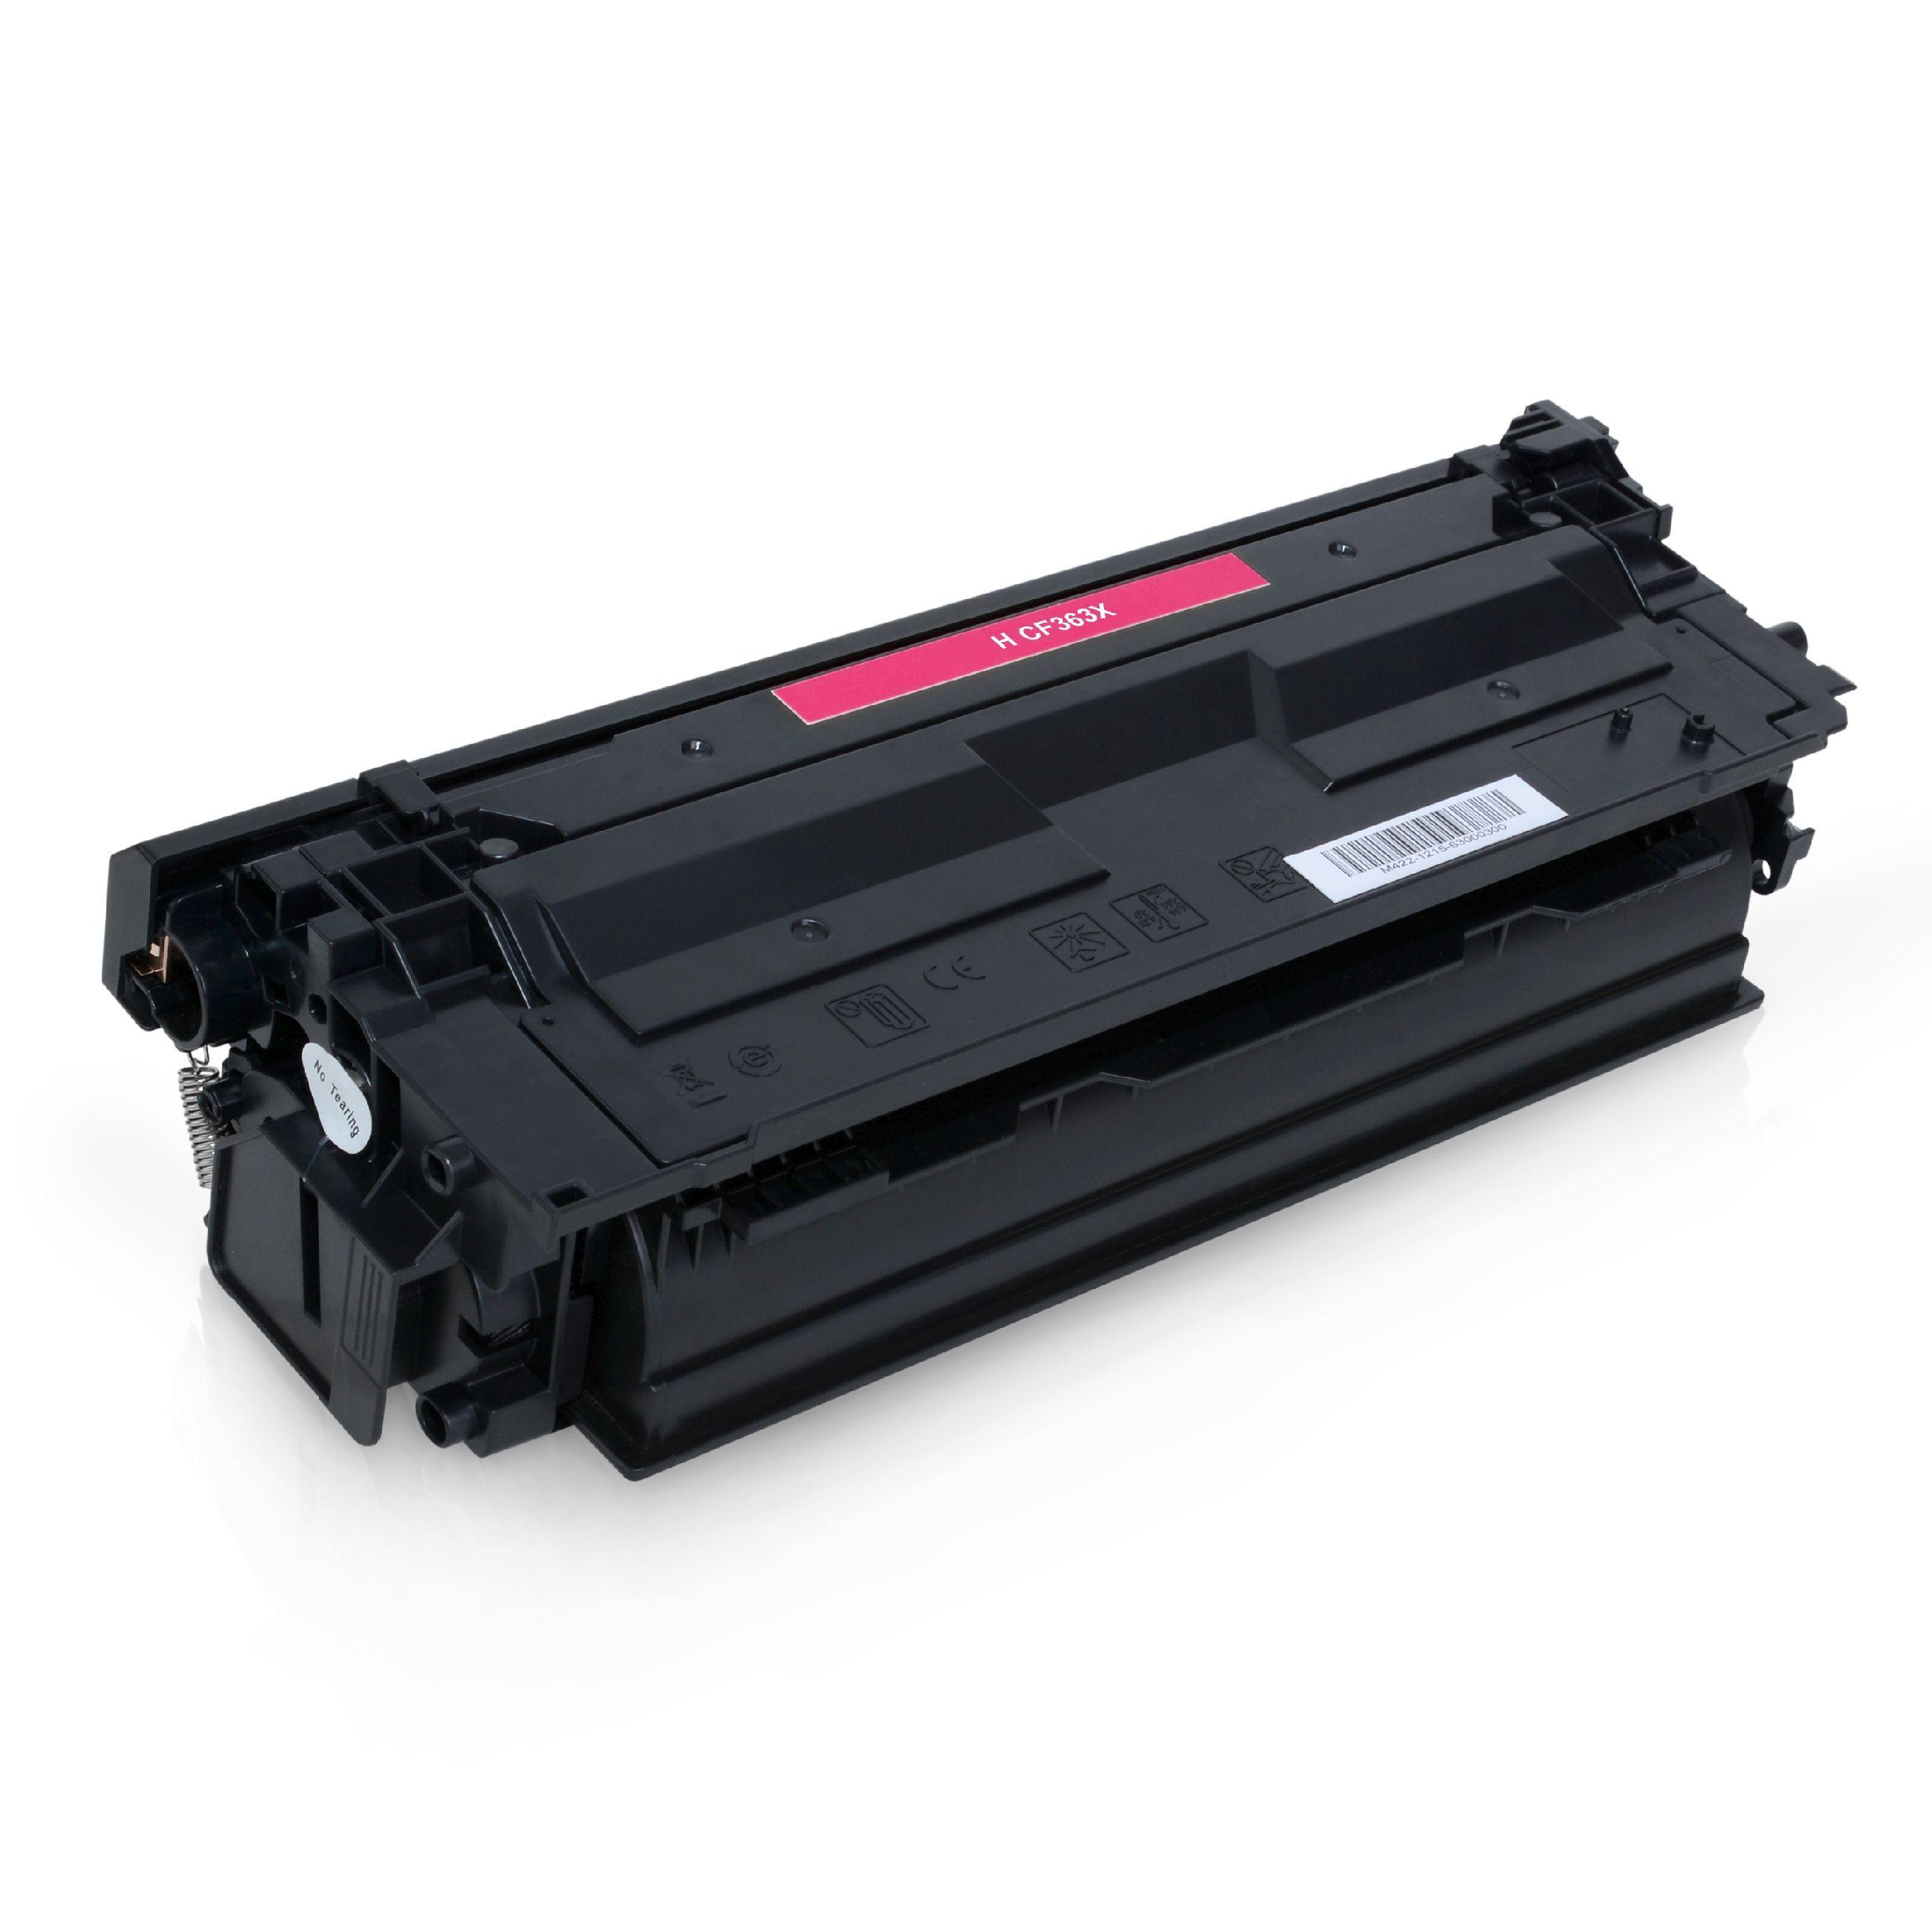 HP Cartouche de Toner pour HP CF363X / 508X magenta compatible (de marque ASC)